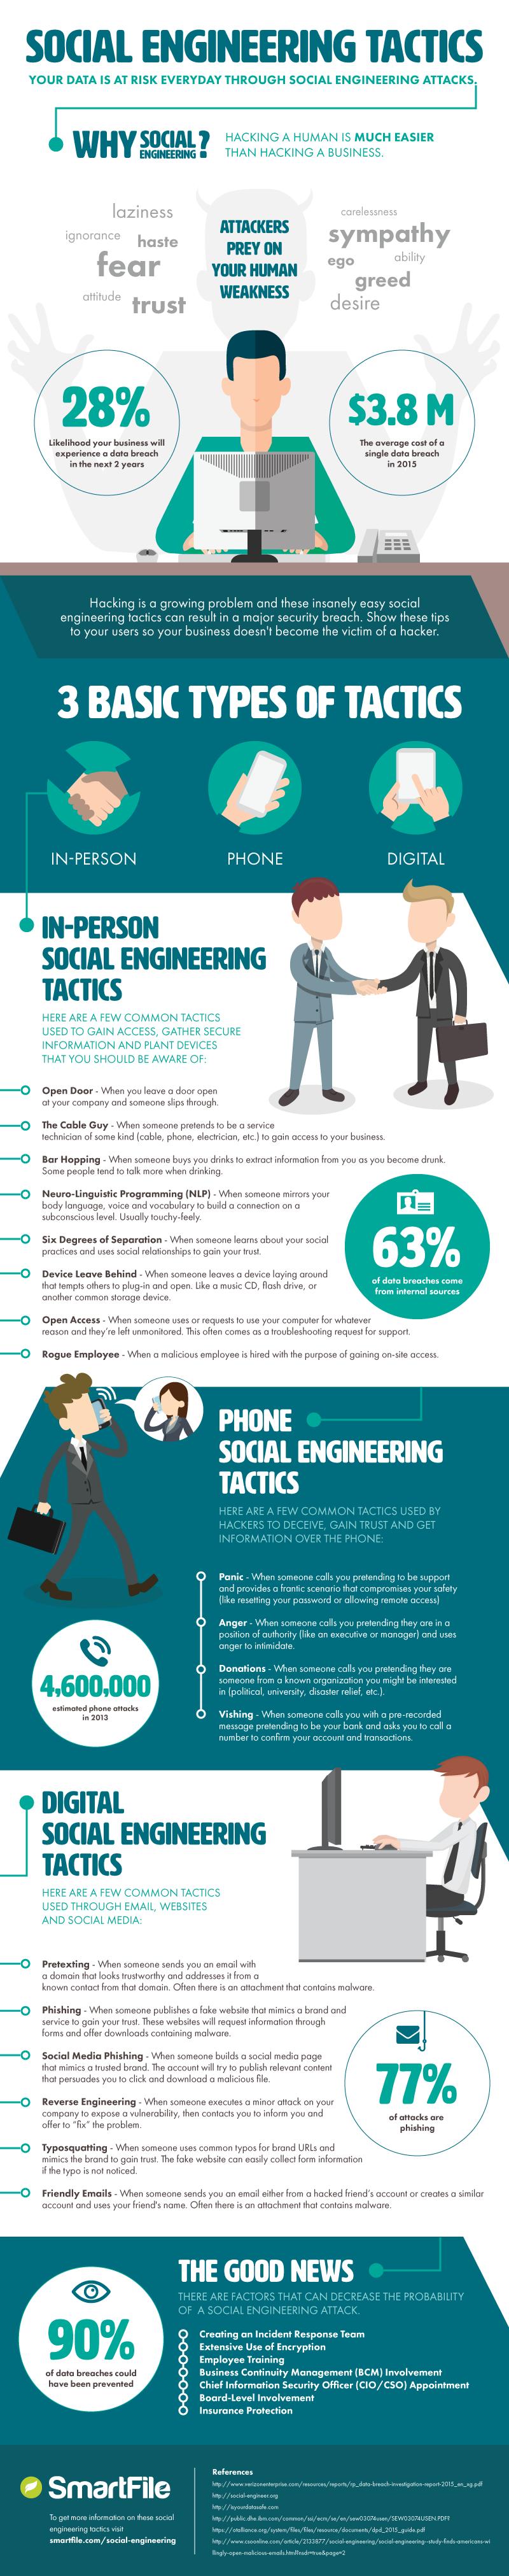 smartfile-social-engineering-infographic